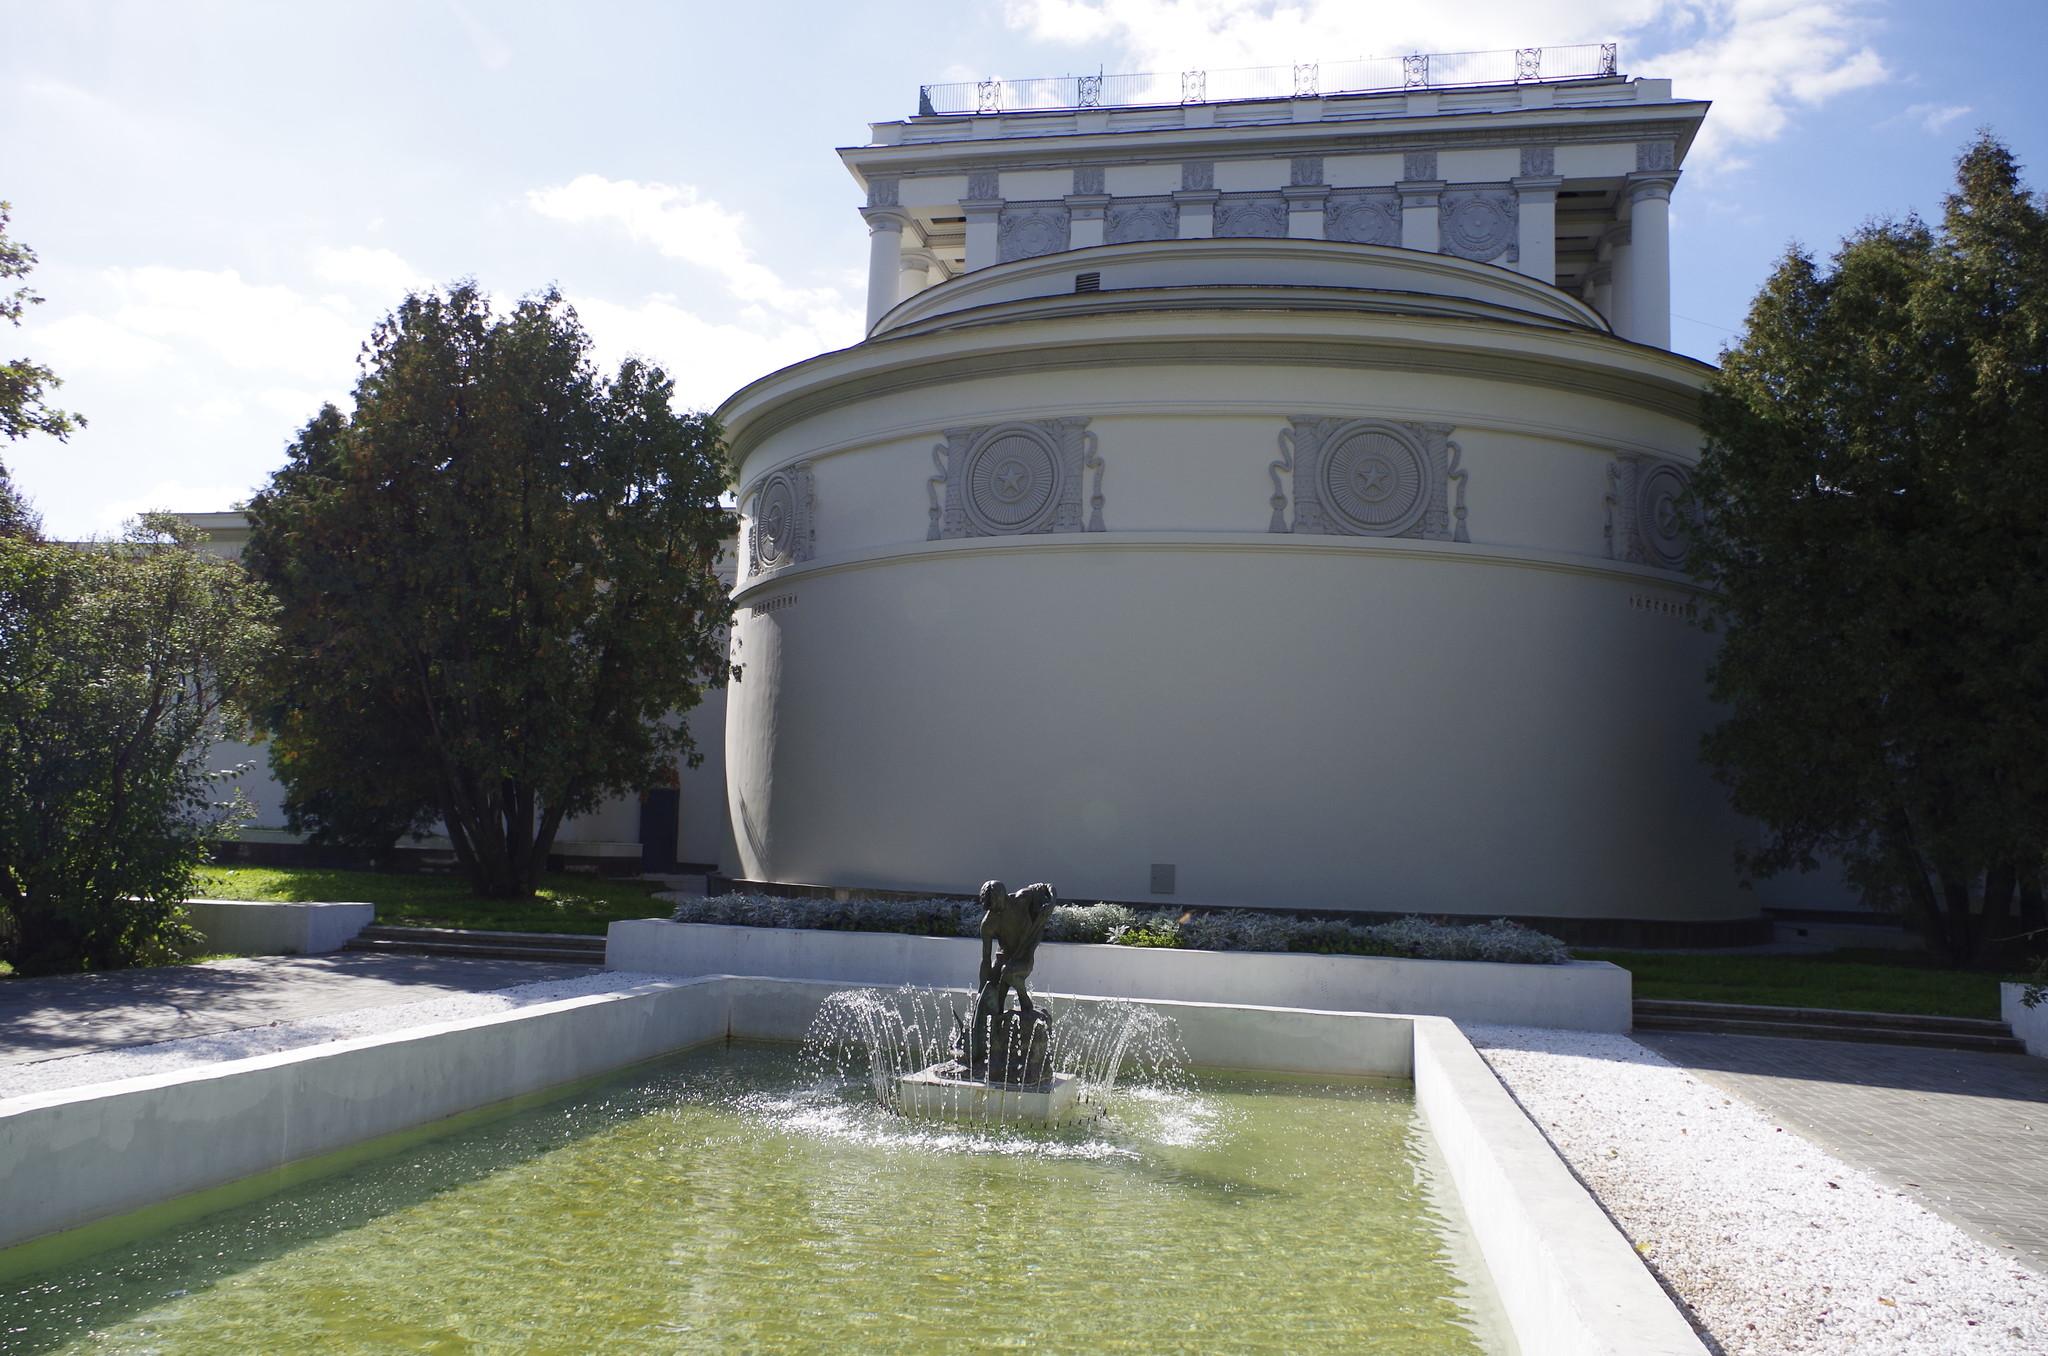 Дворик с бассейном позади павильона № 64 «Оптика»